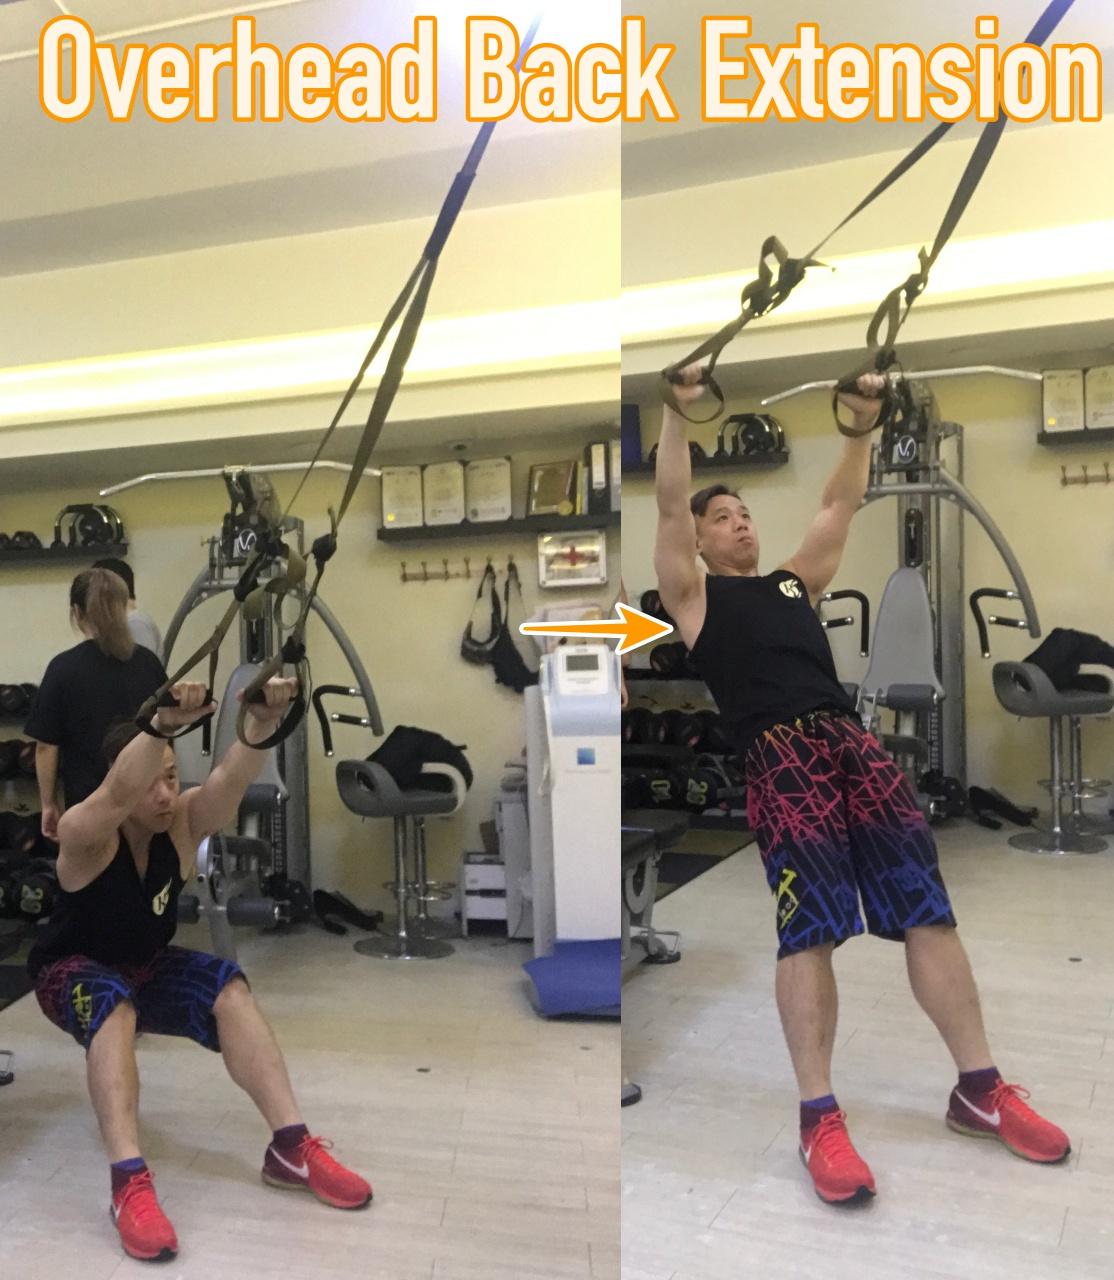 TRX訓練動作 Overhead Back Extension